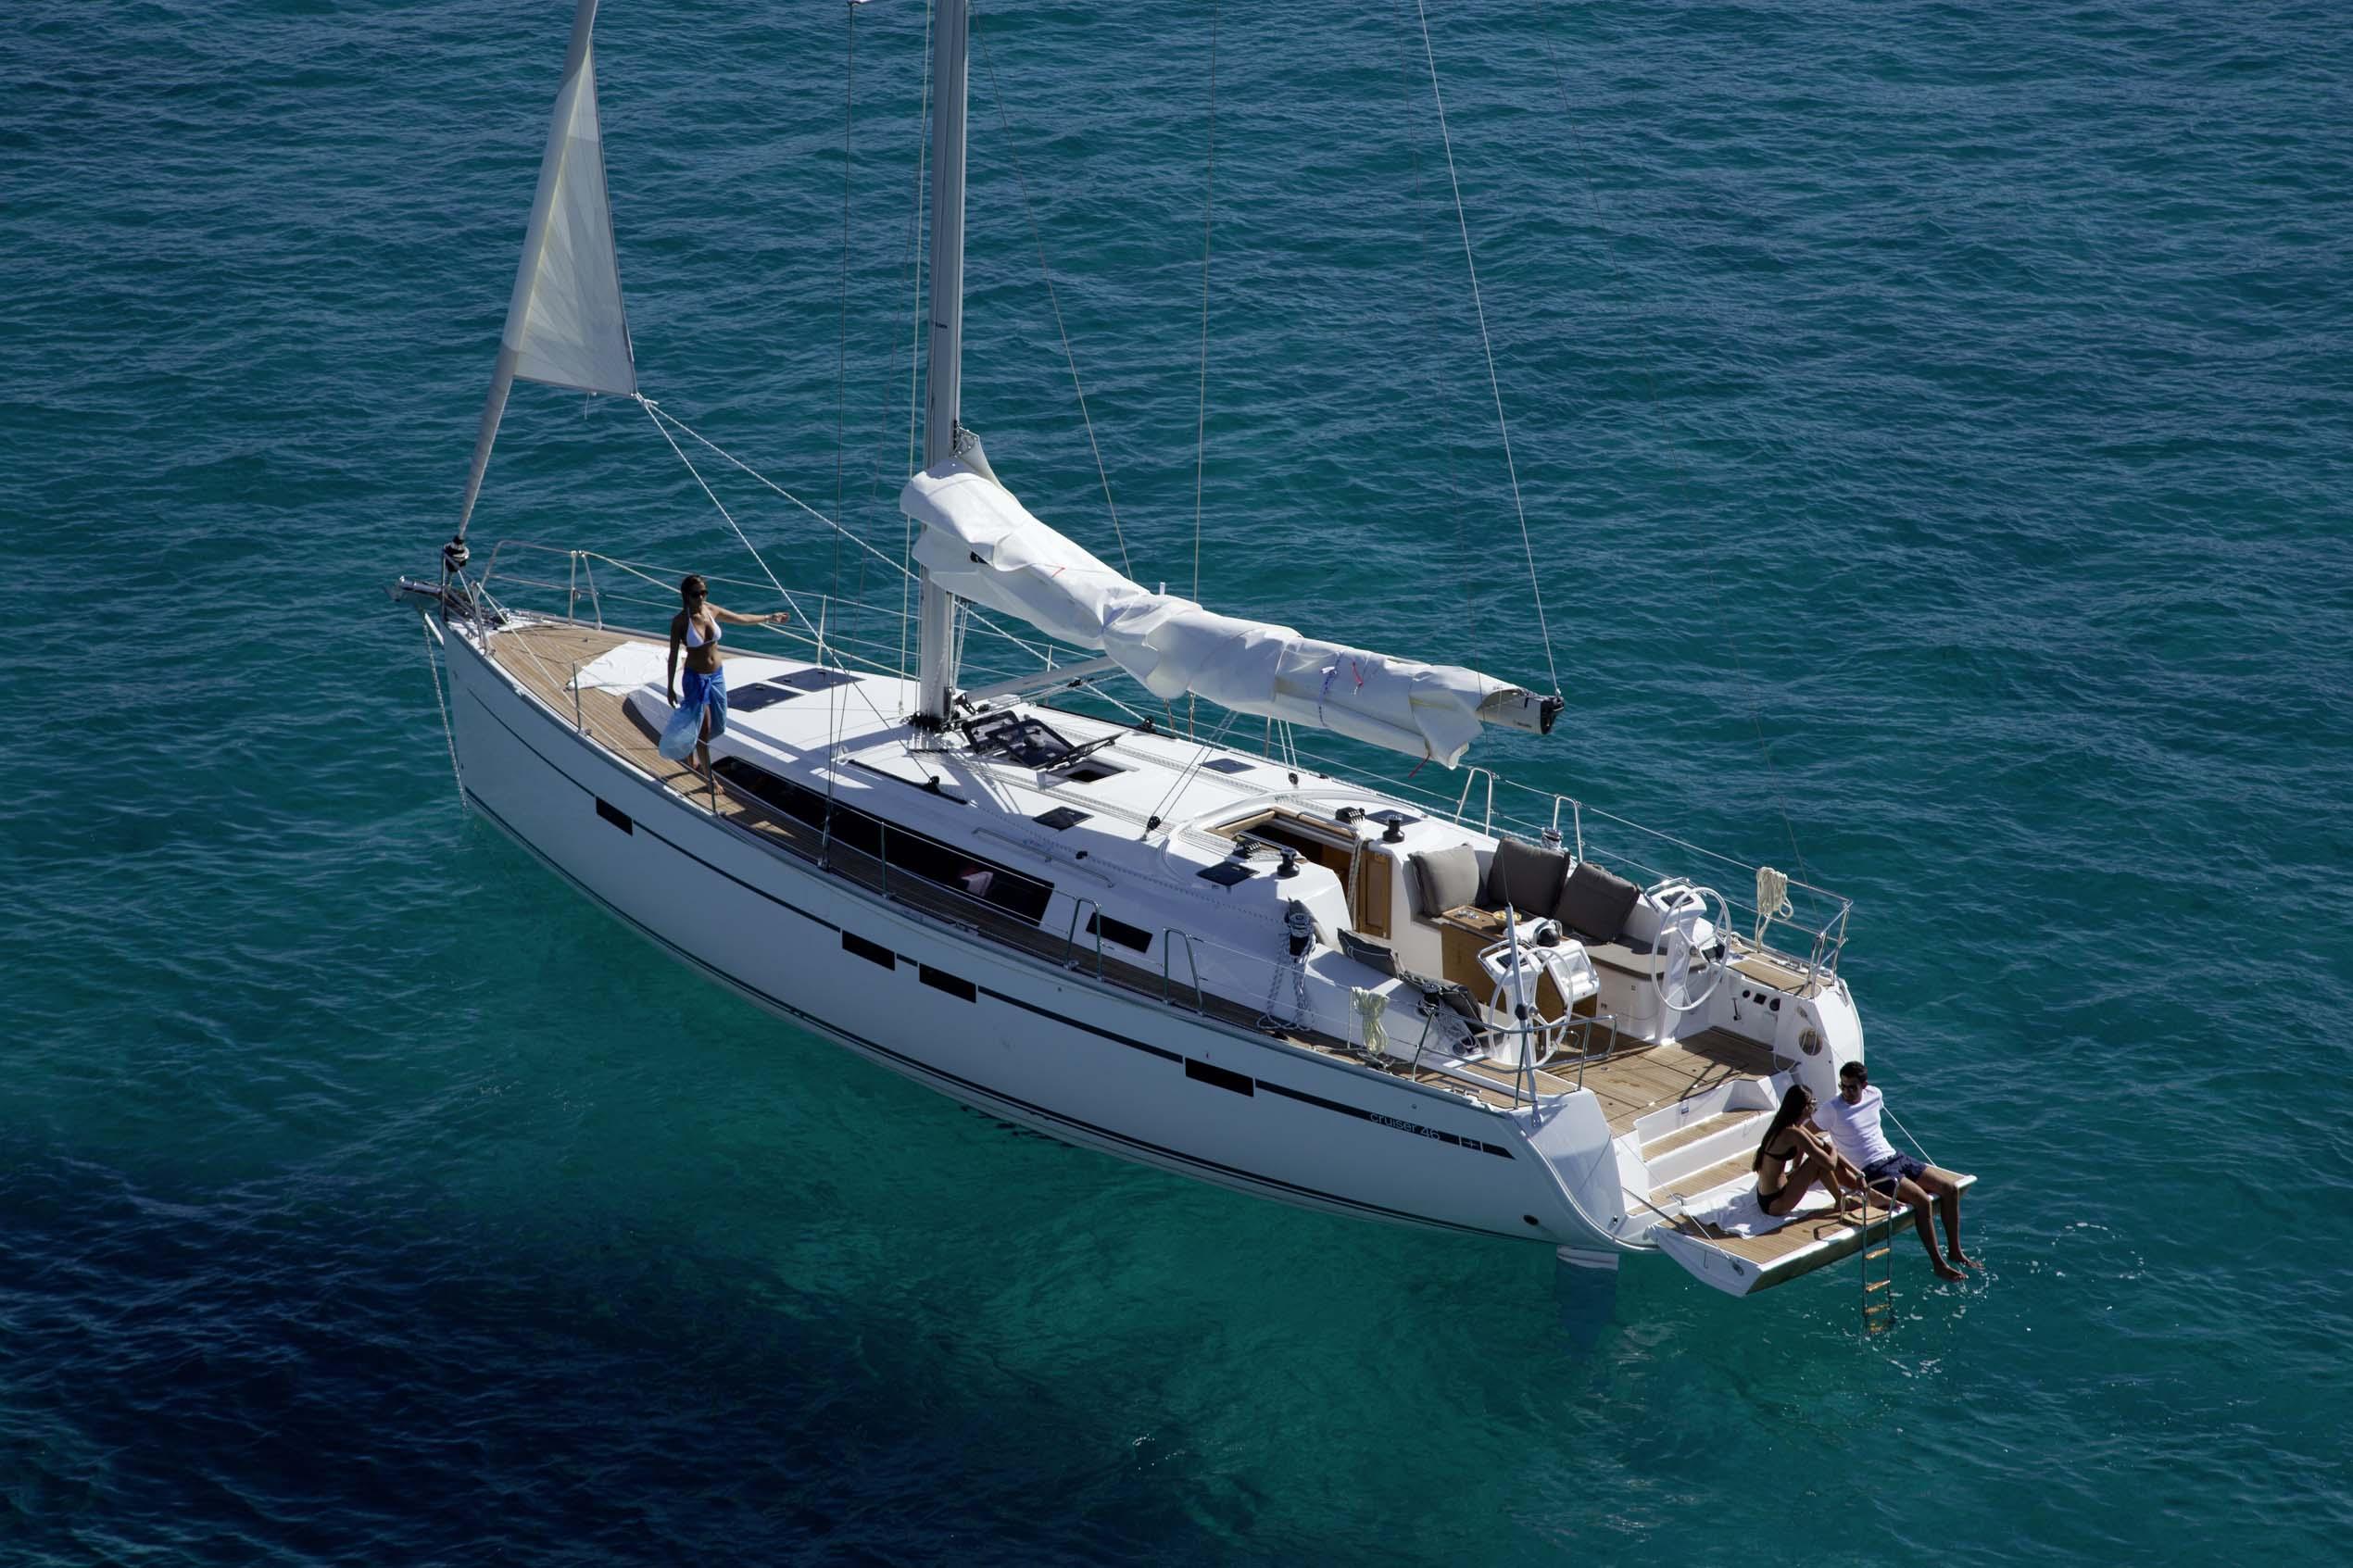 bavaria-46-cruiser-charter-croatia-rental